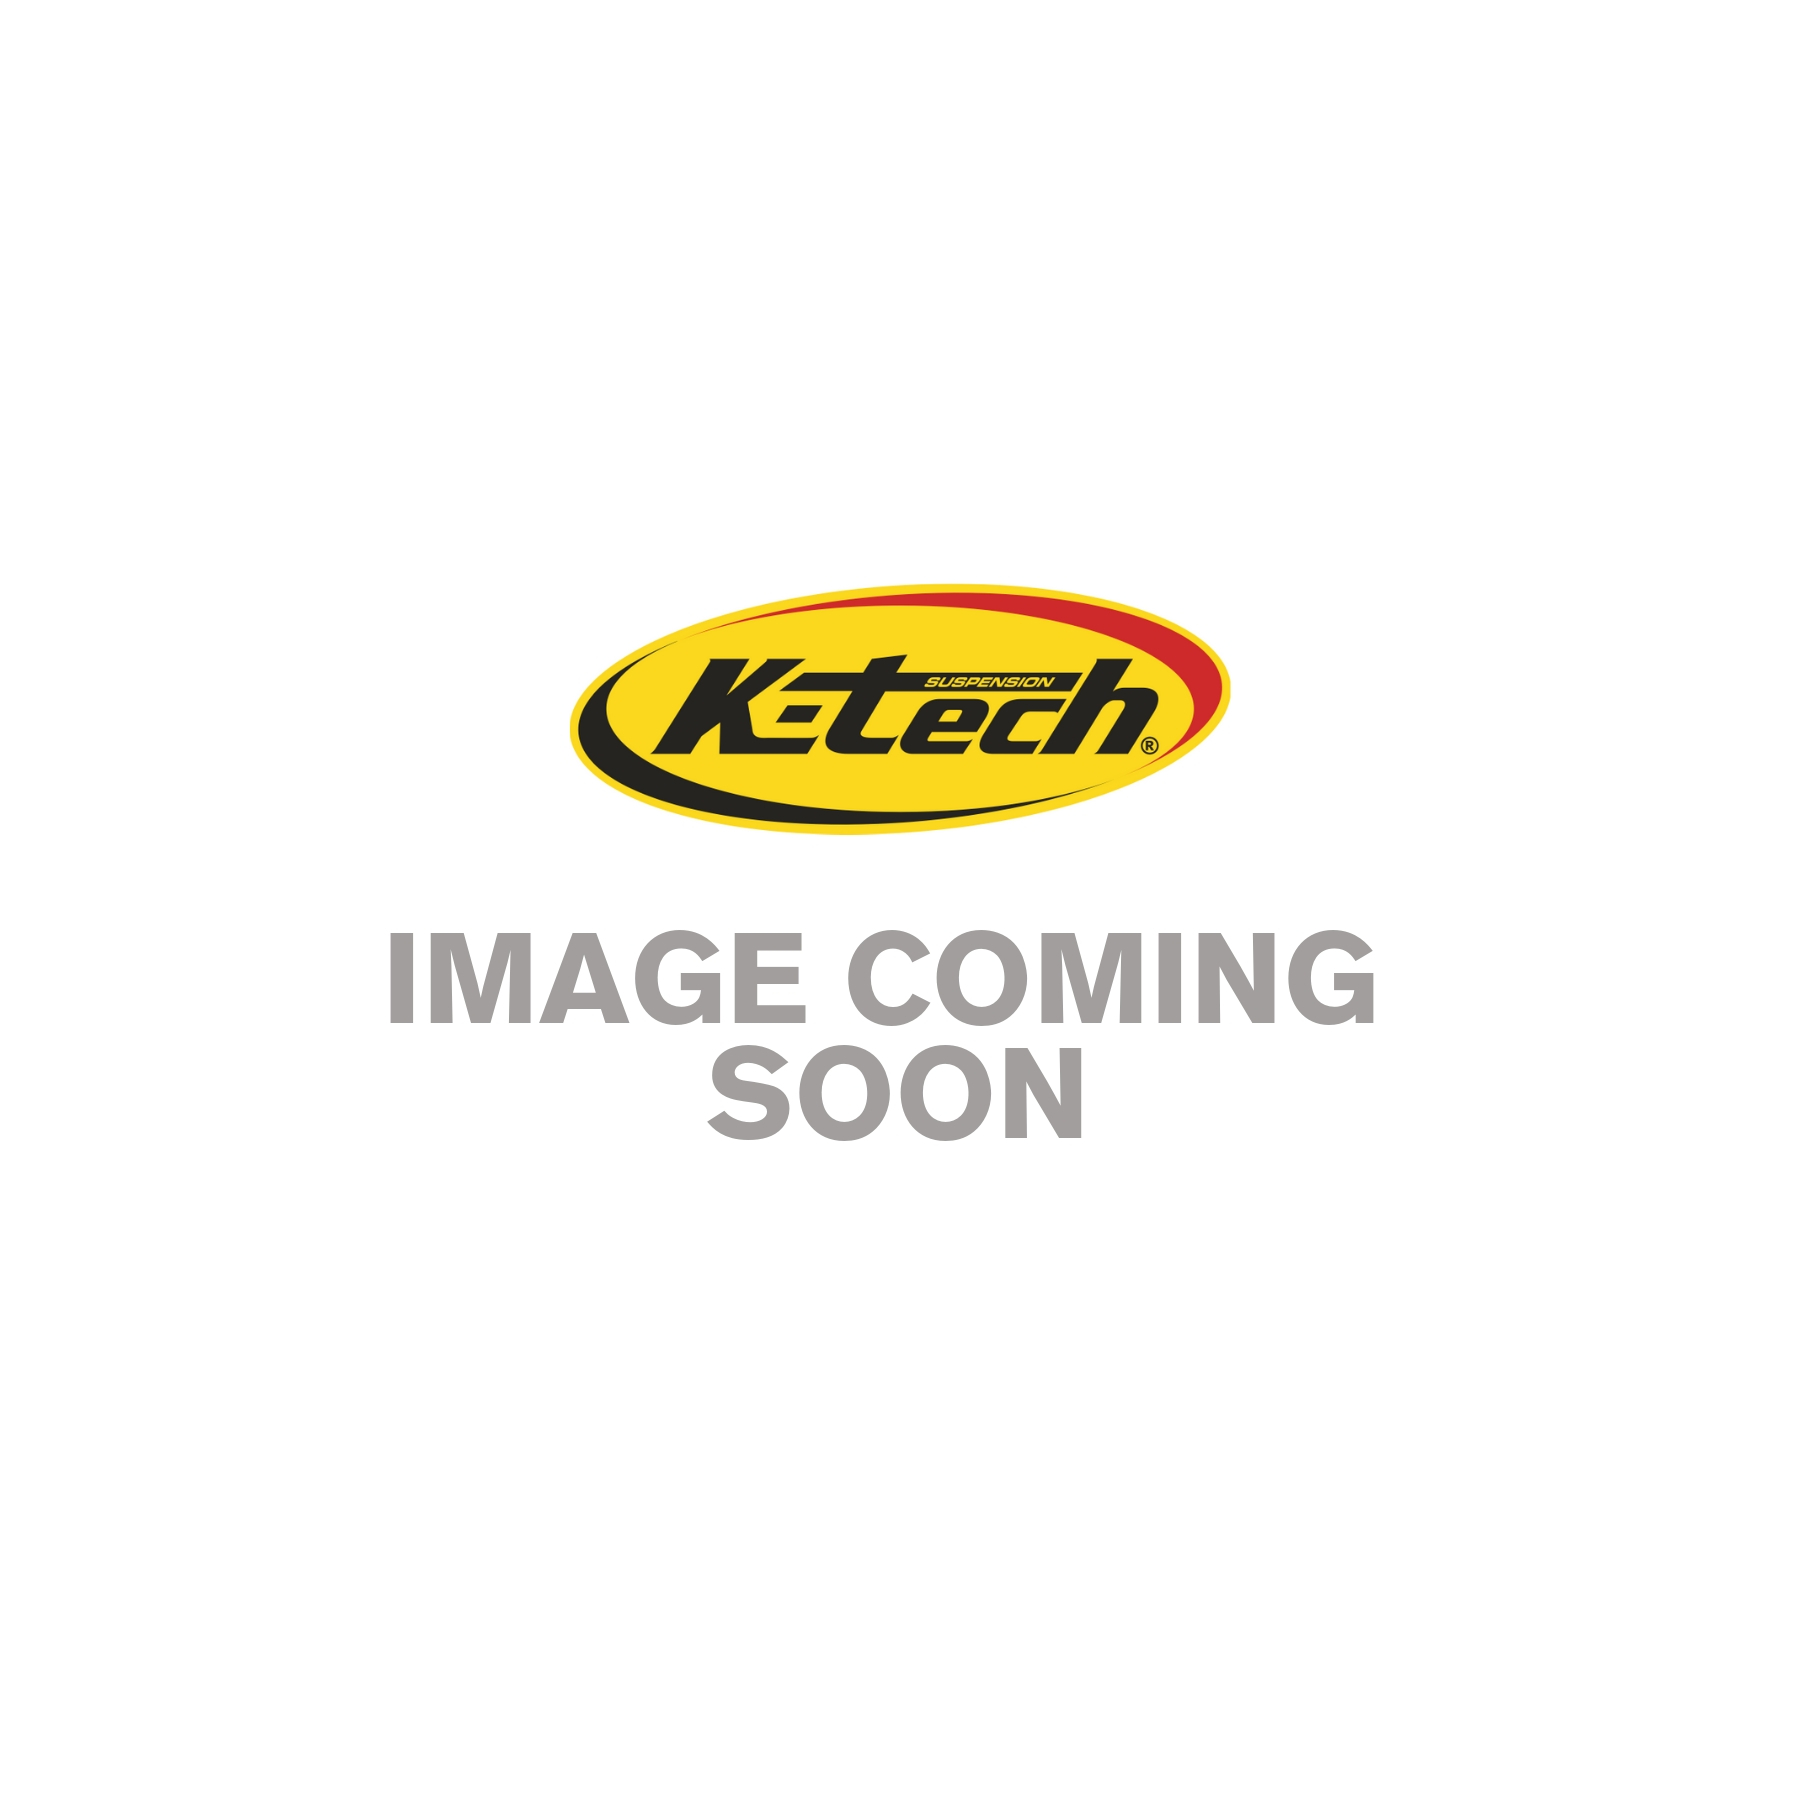 DDS Lite Shock Absorber Triumph Daytona, Street Triple 675/675-R 2013-2016